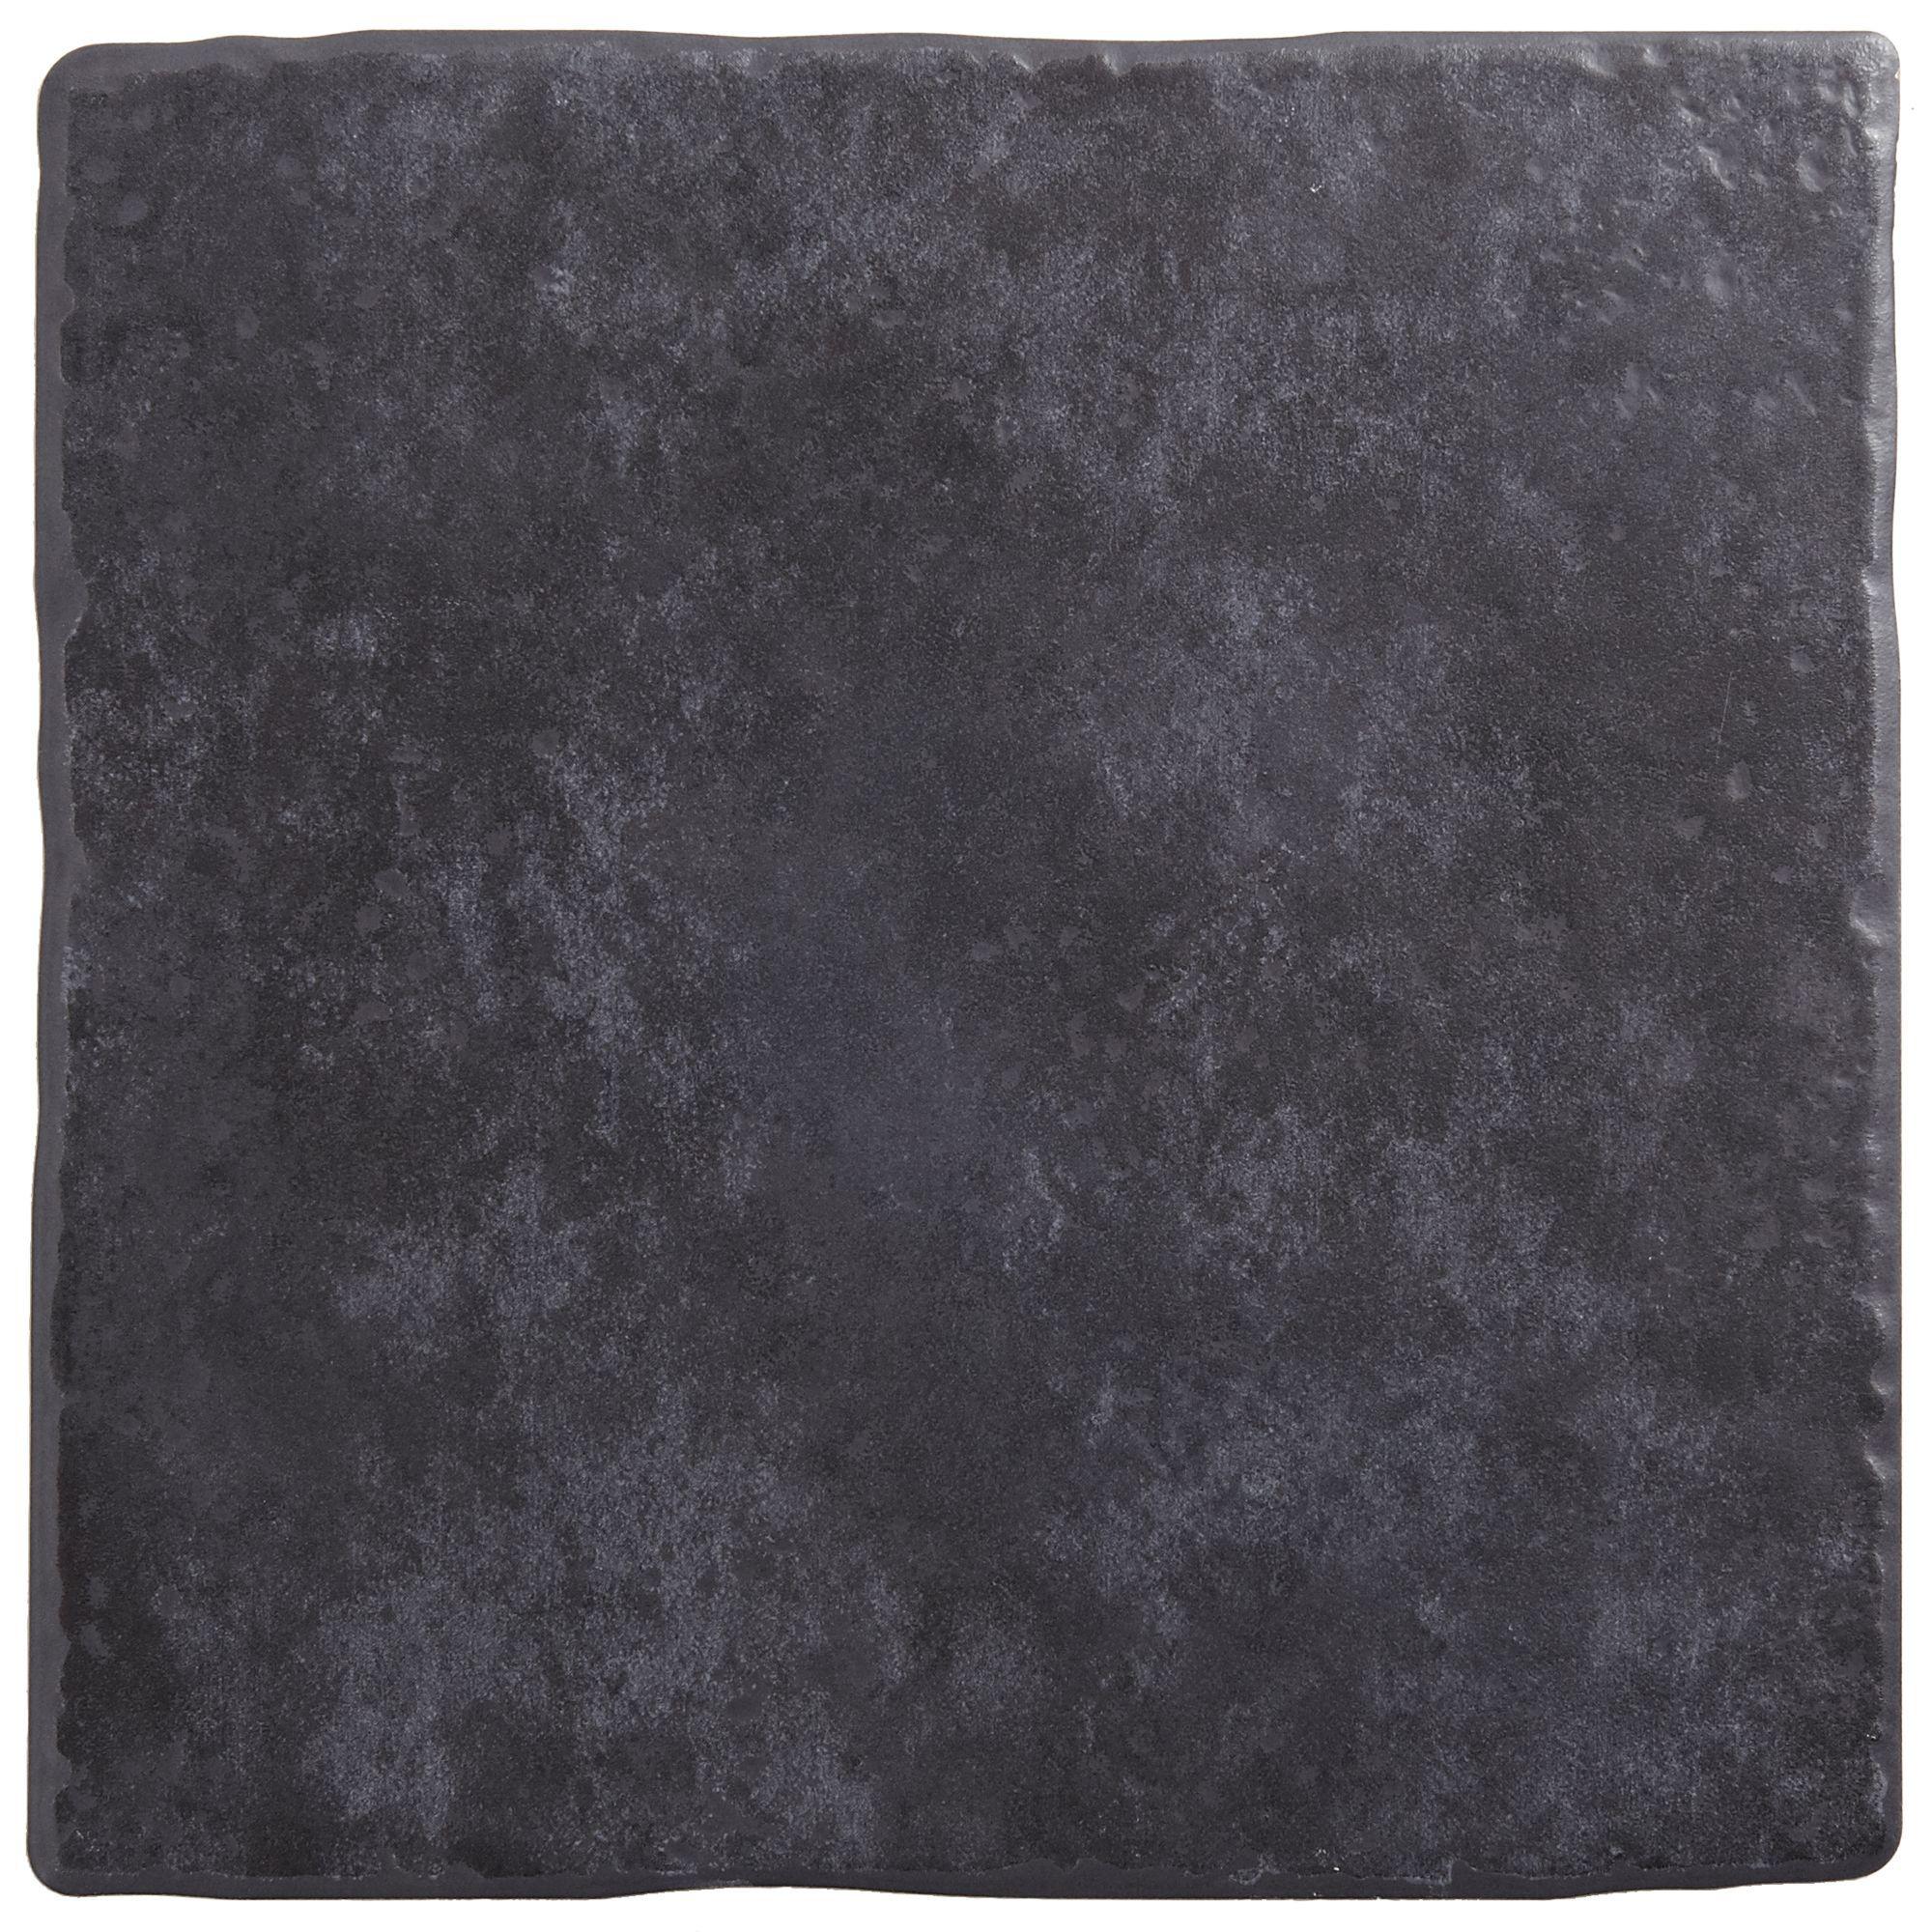 Oscano Graphite Stone Effect Ceramic Wall Floor Tile